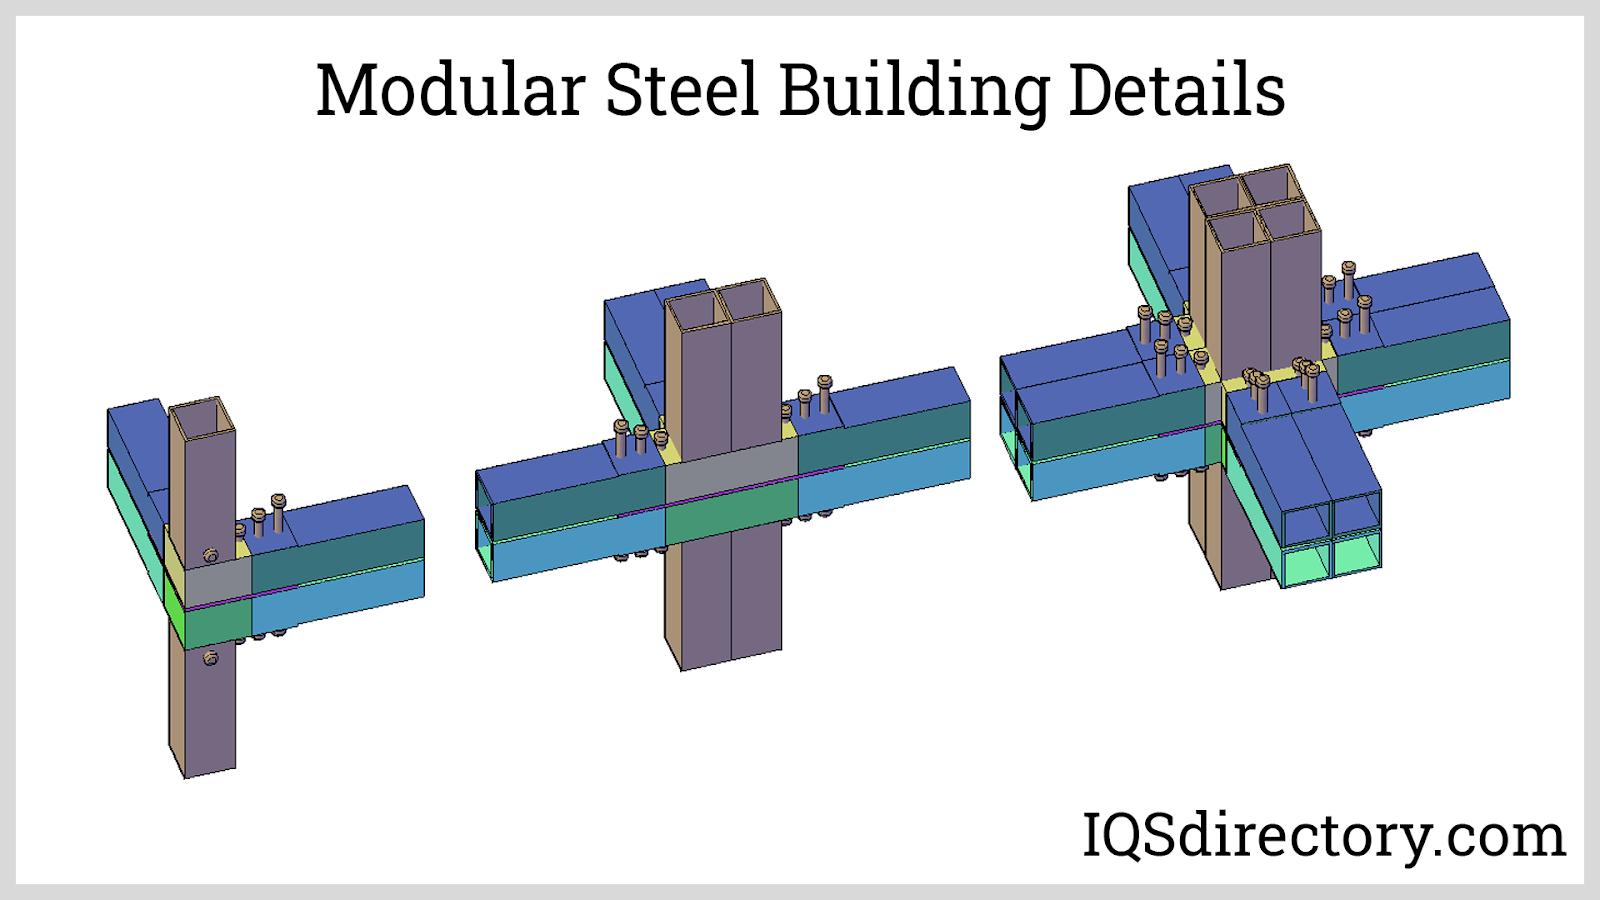 Modular Steel Building Details